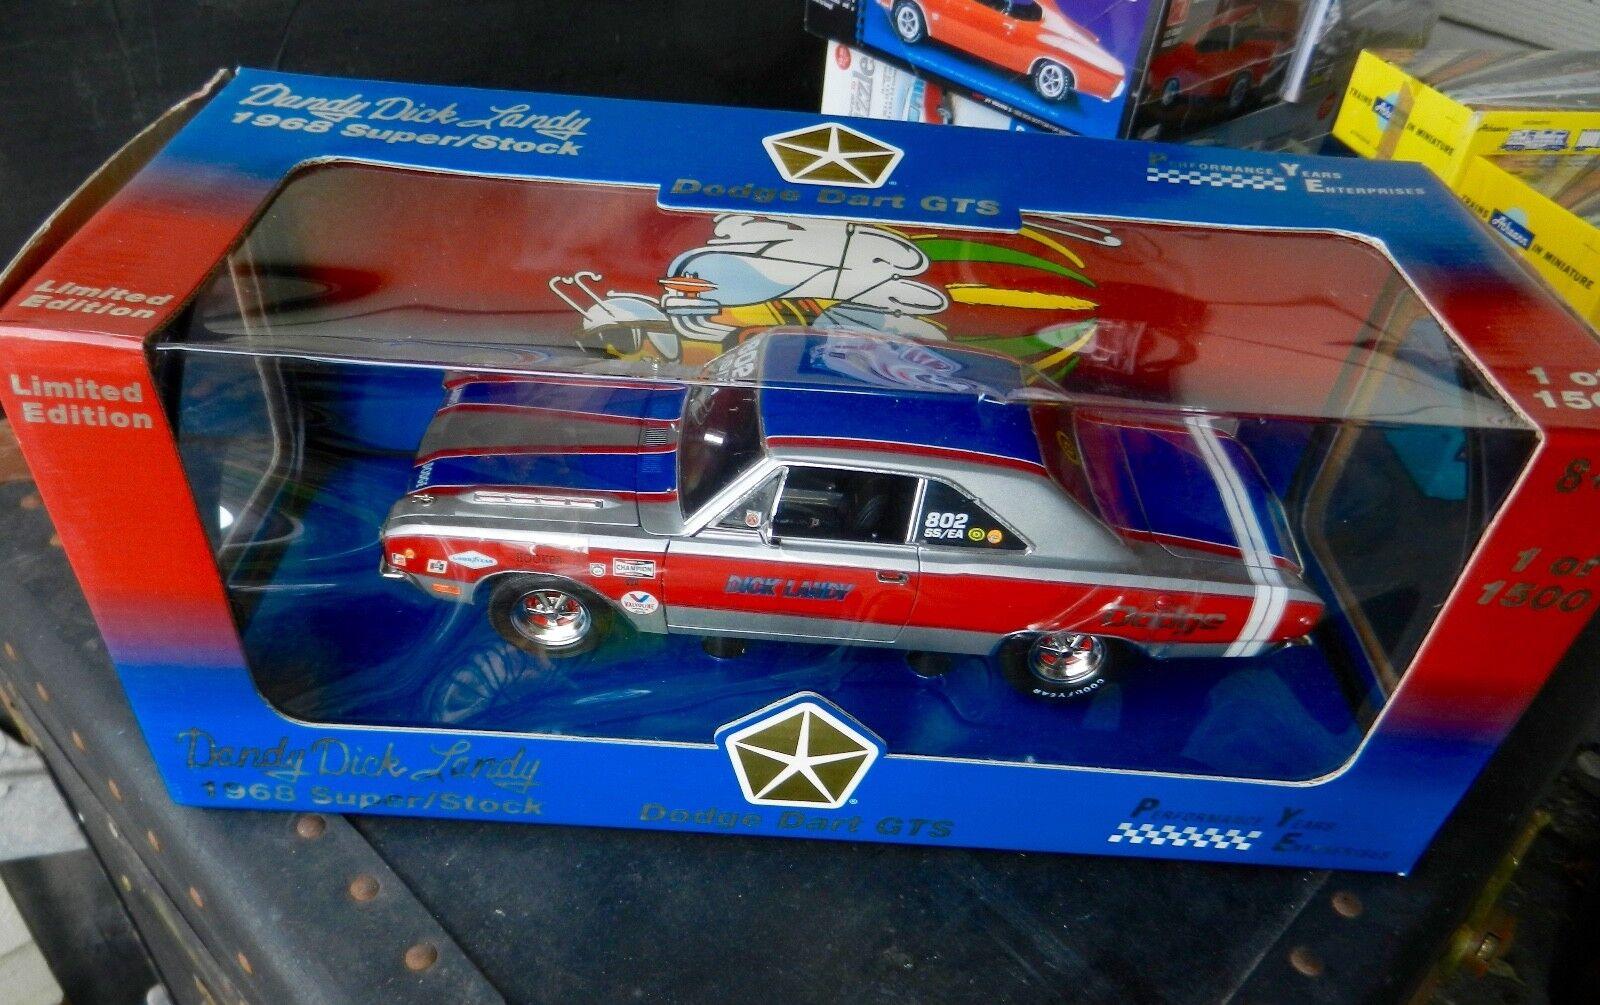 Ertl DCP 1968 Dodge Dart GTS DICK LANDY's Super Stock SS EA  Dandy Dick  1 18th